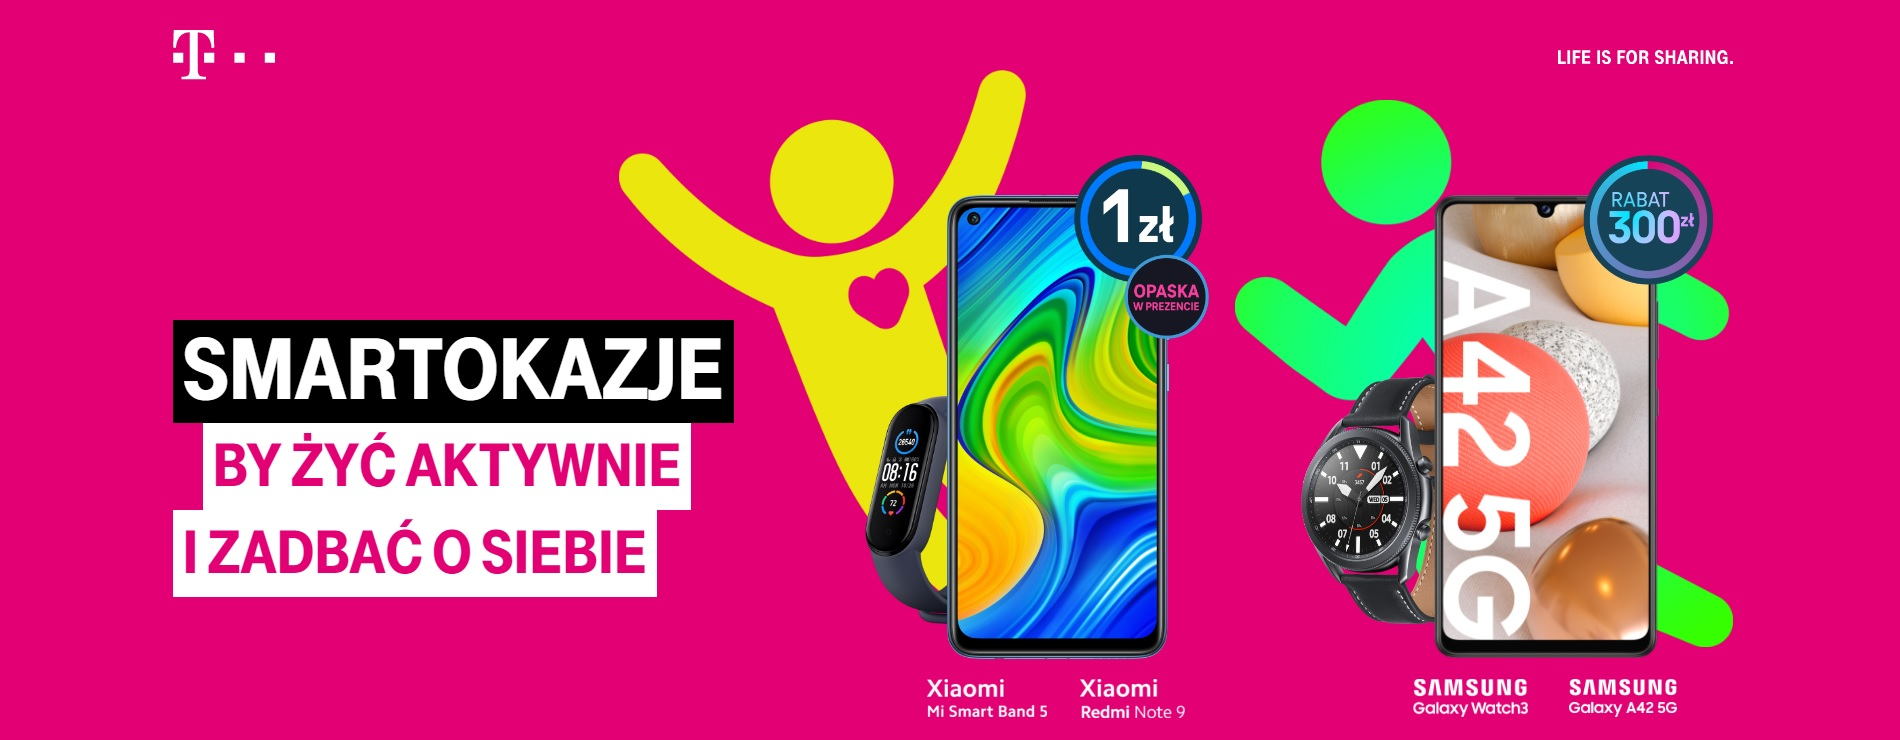 Smartokazje T-Mobile